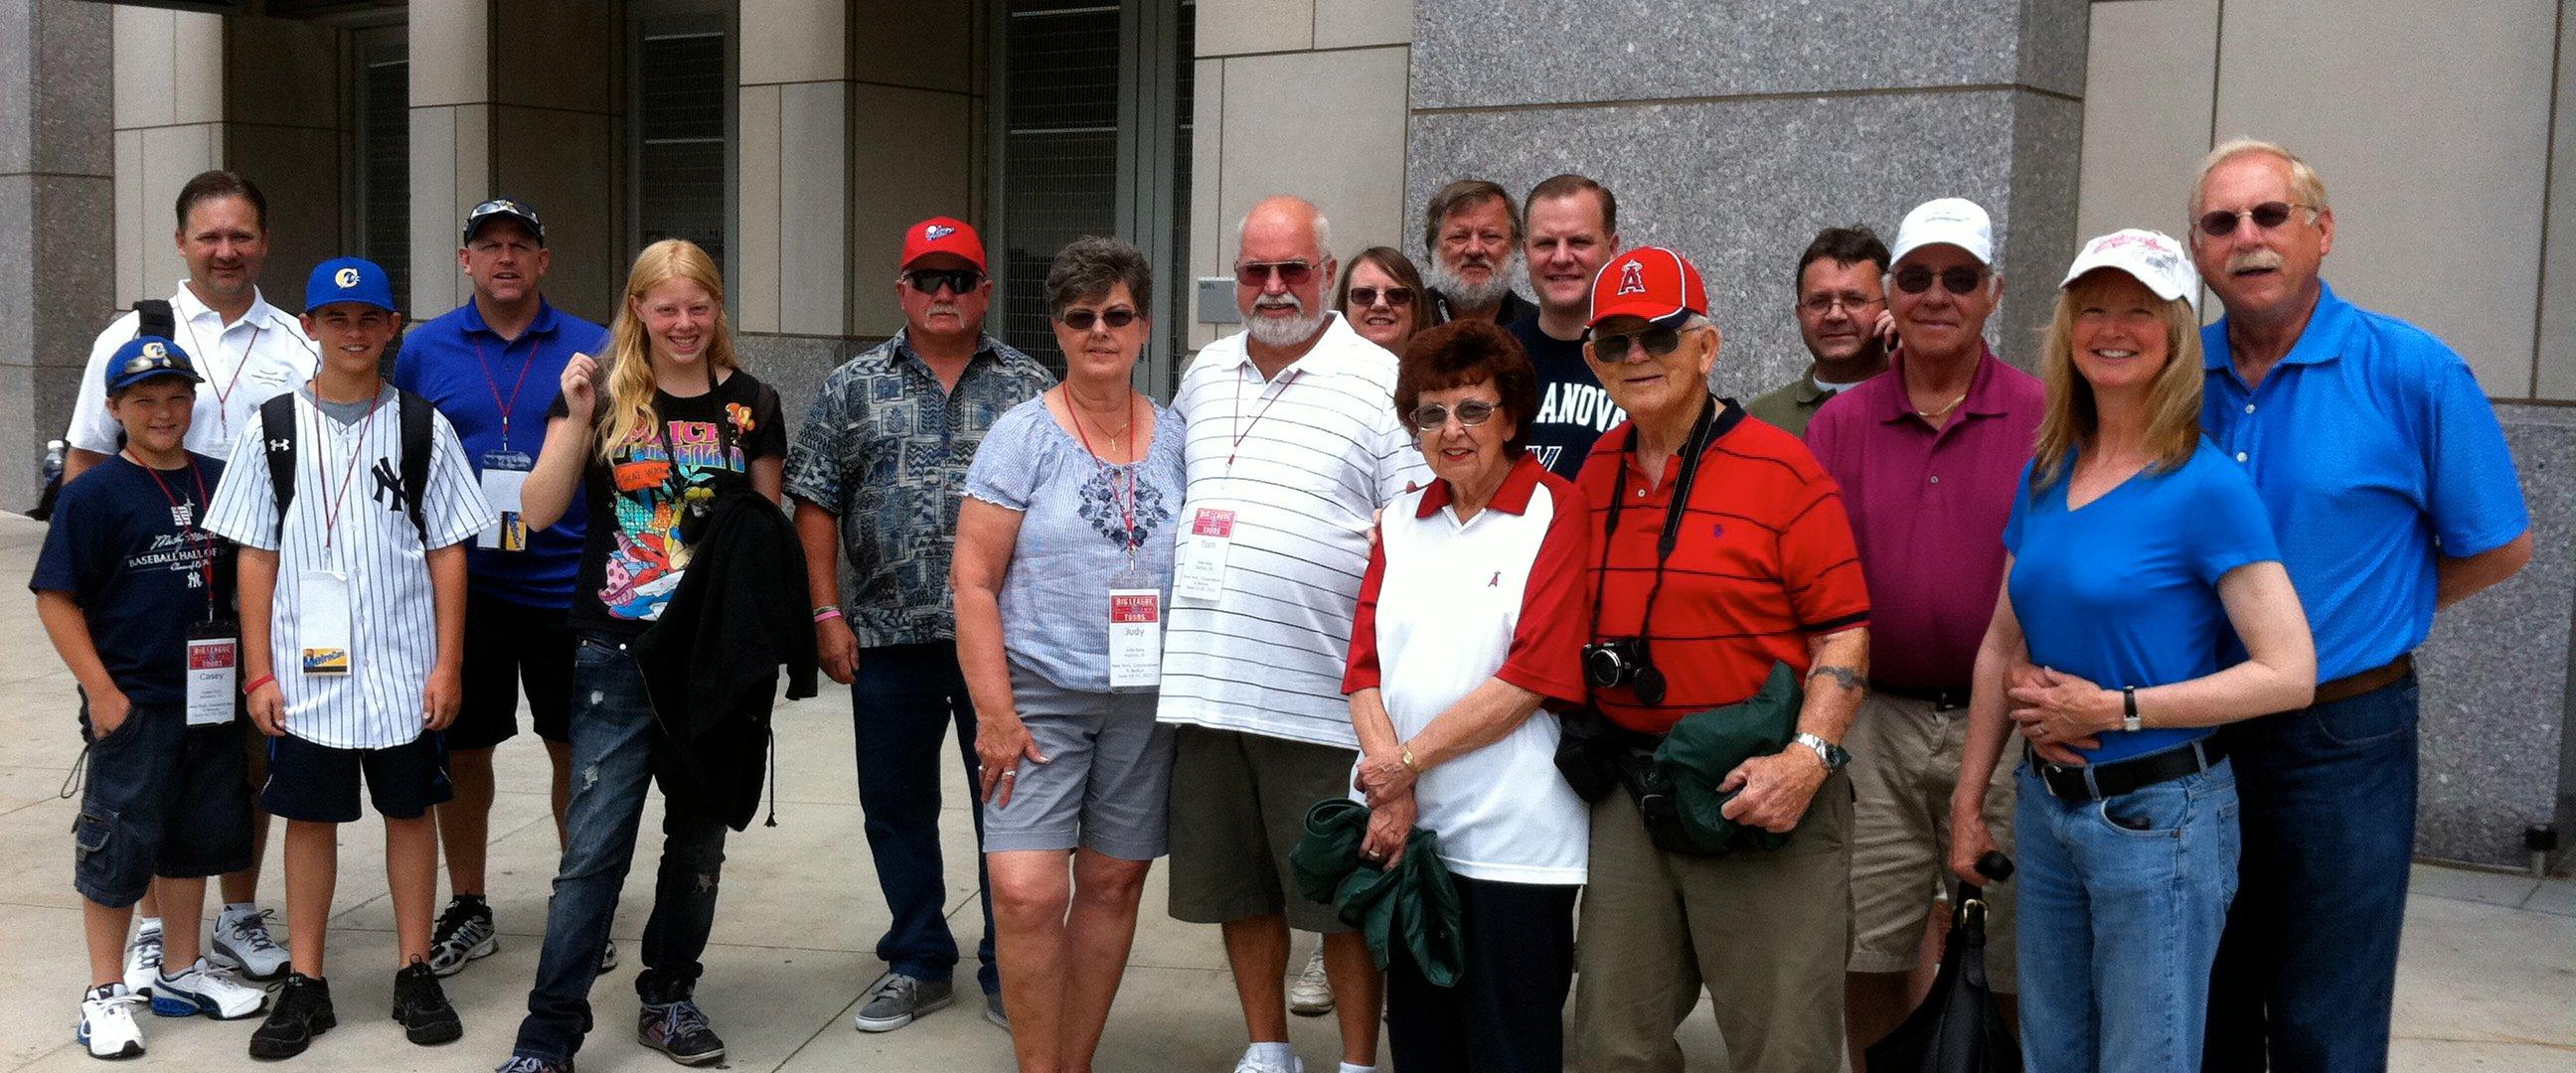 Private group tour of Yankee Stadium